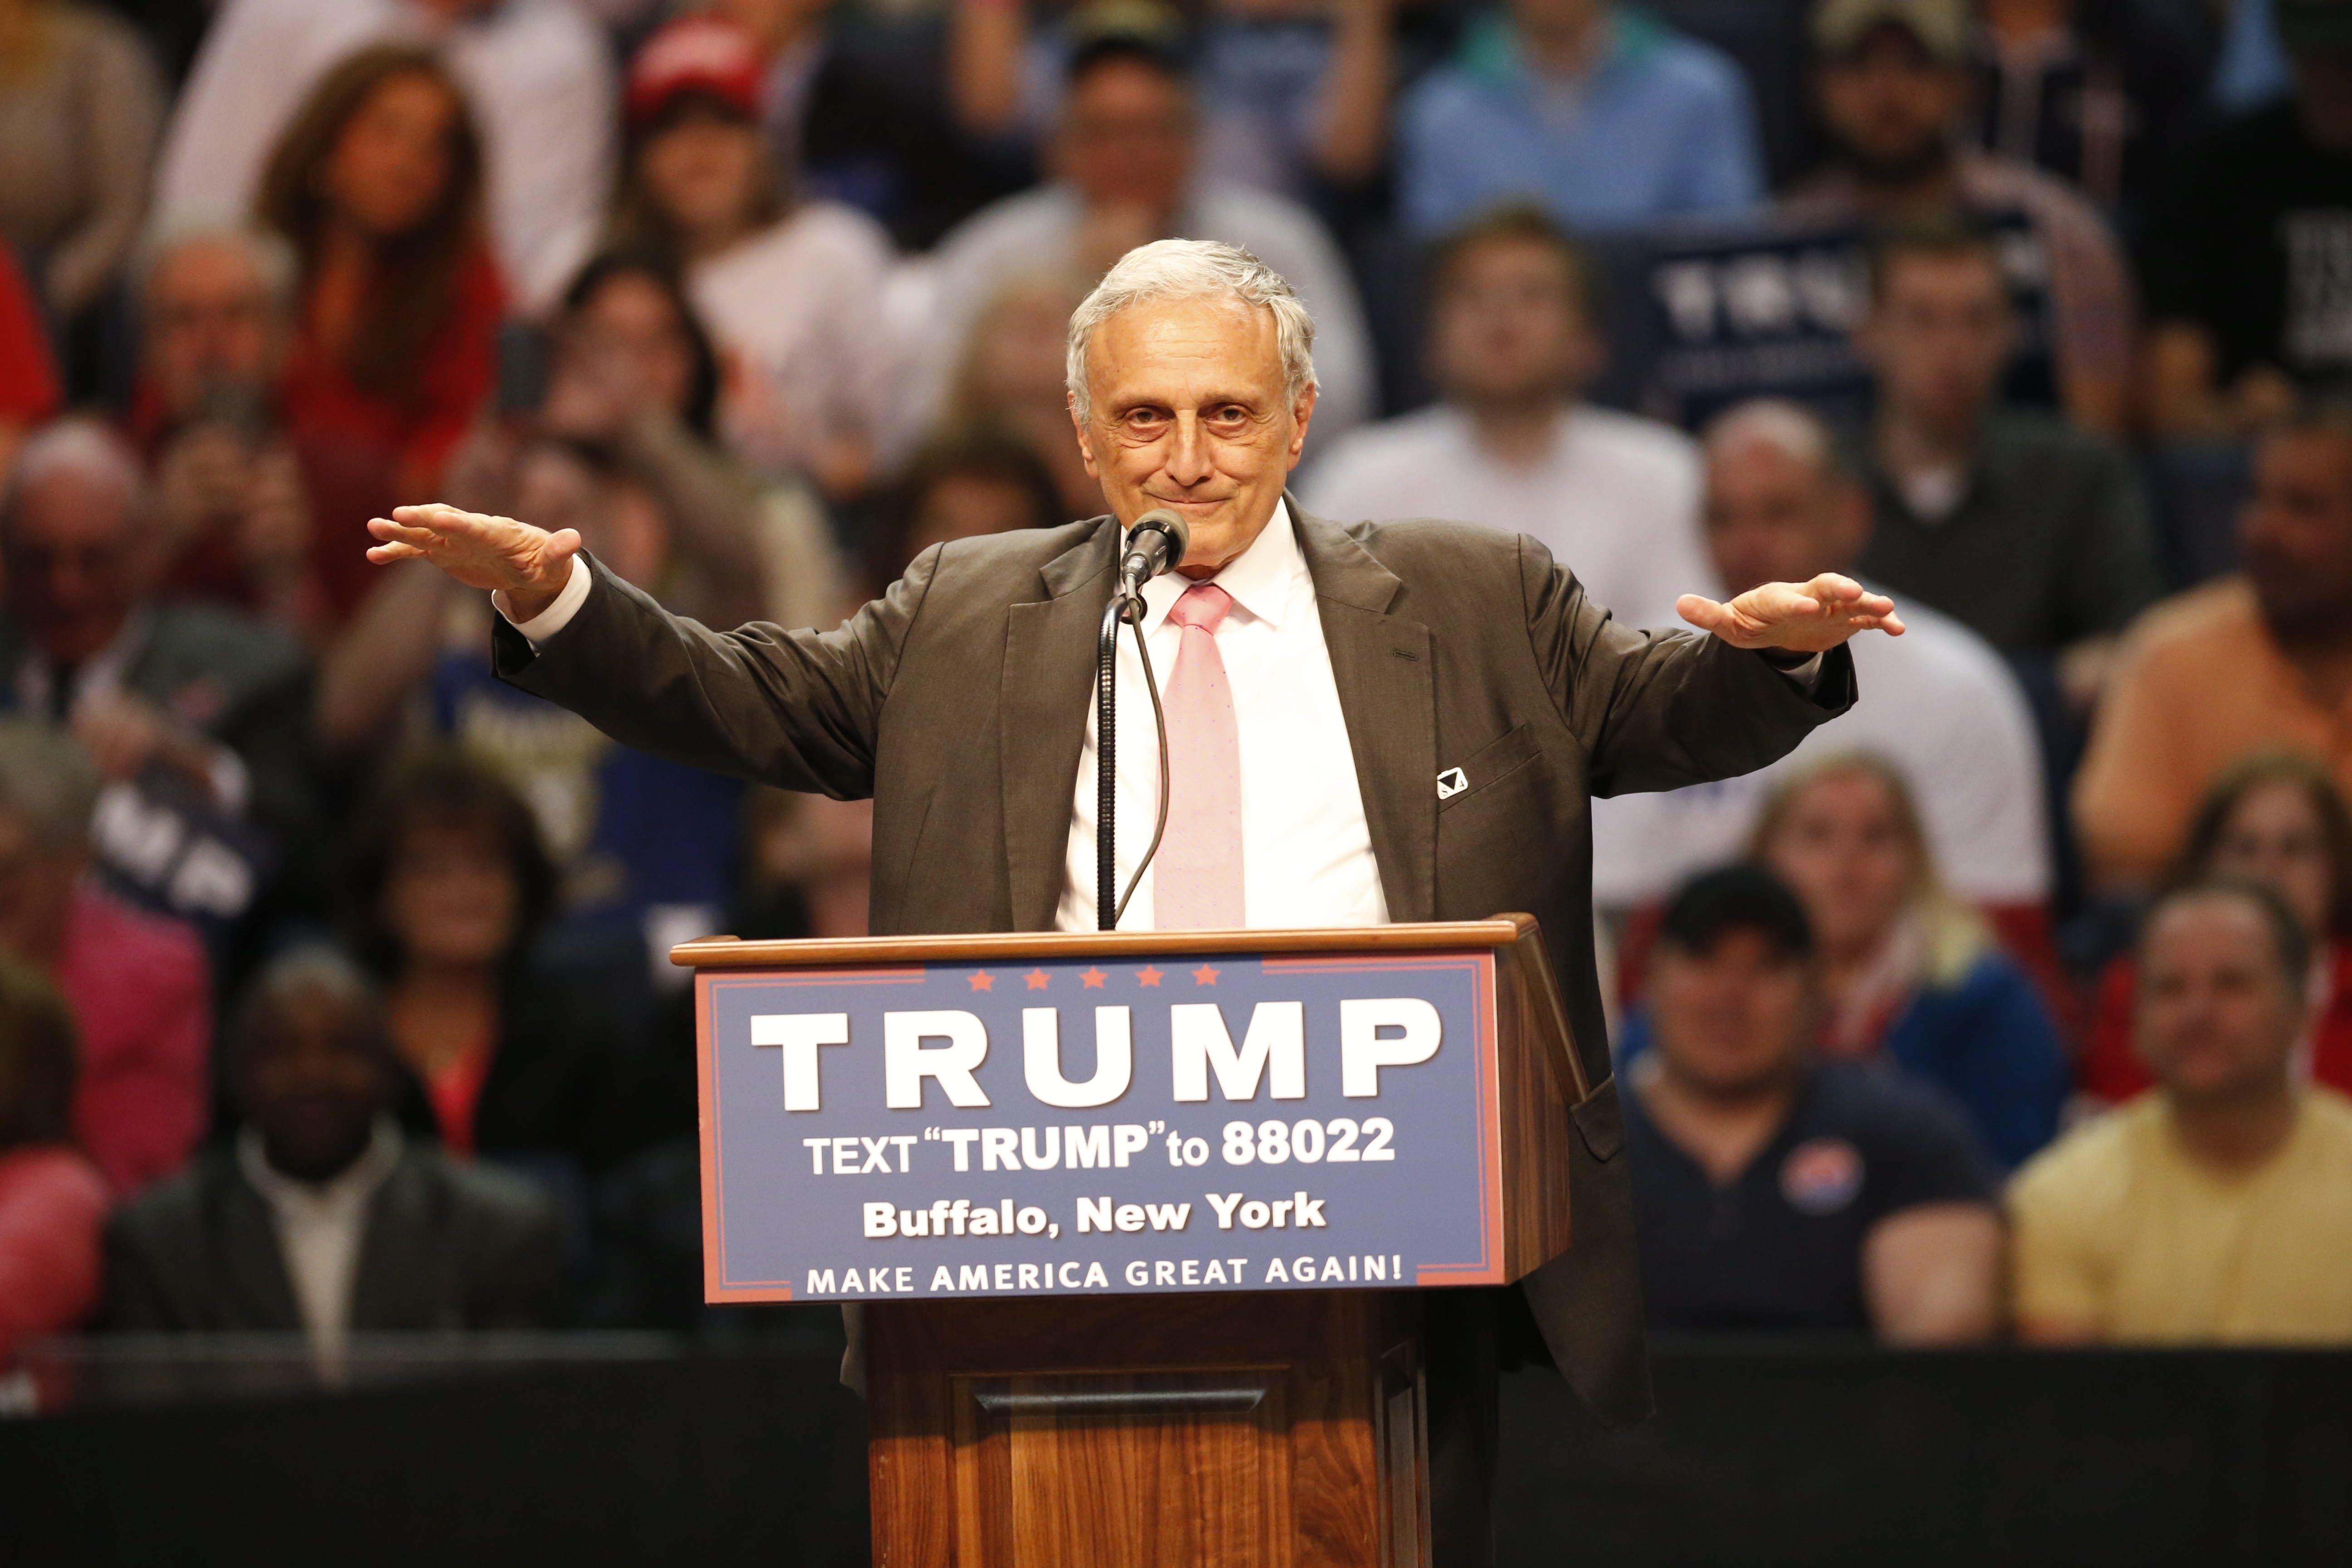 Carl Paladino speaks during the Trump rally at First Niagara Center in Buffalo, N.Y.  Monday, April 18, 2016.  (Derek Gee/Buffalo News)